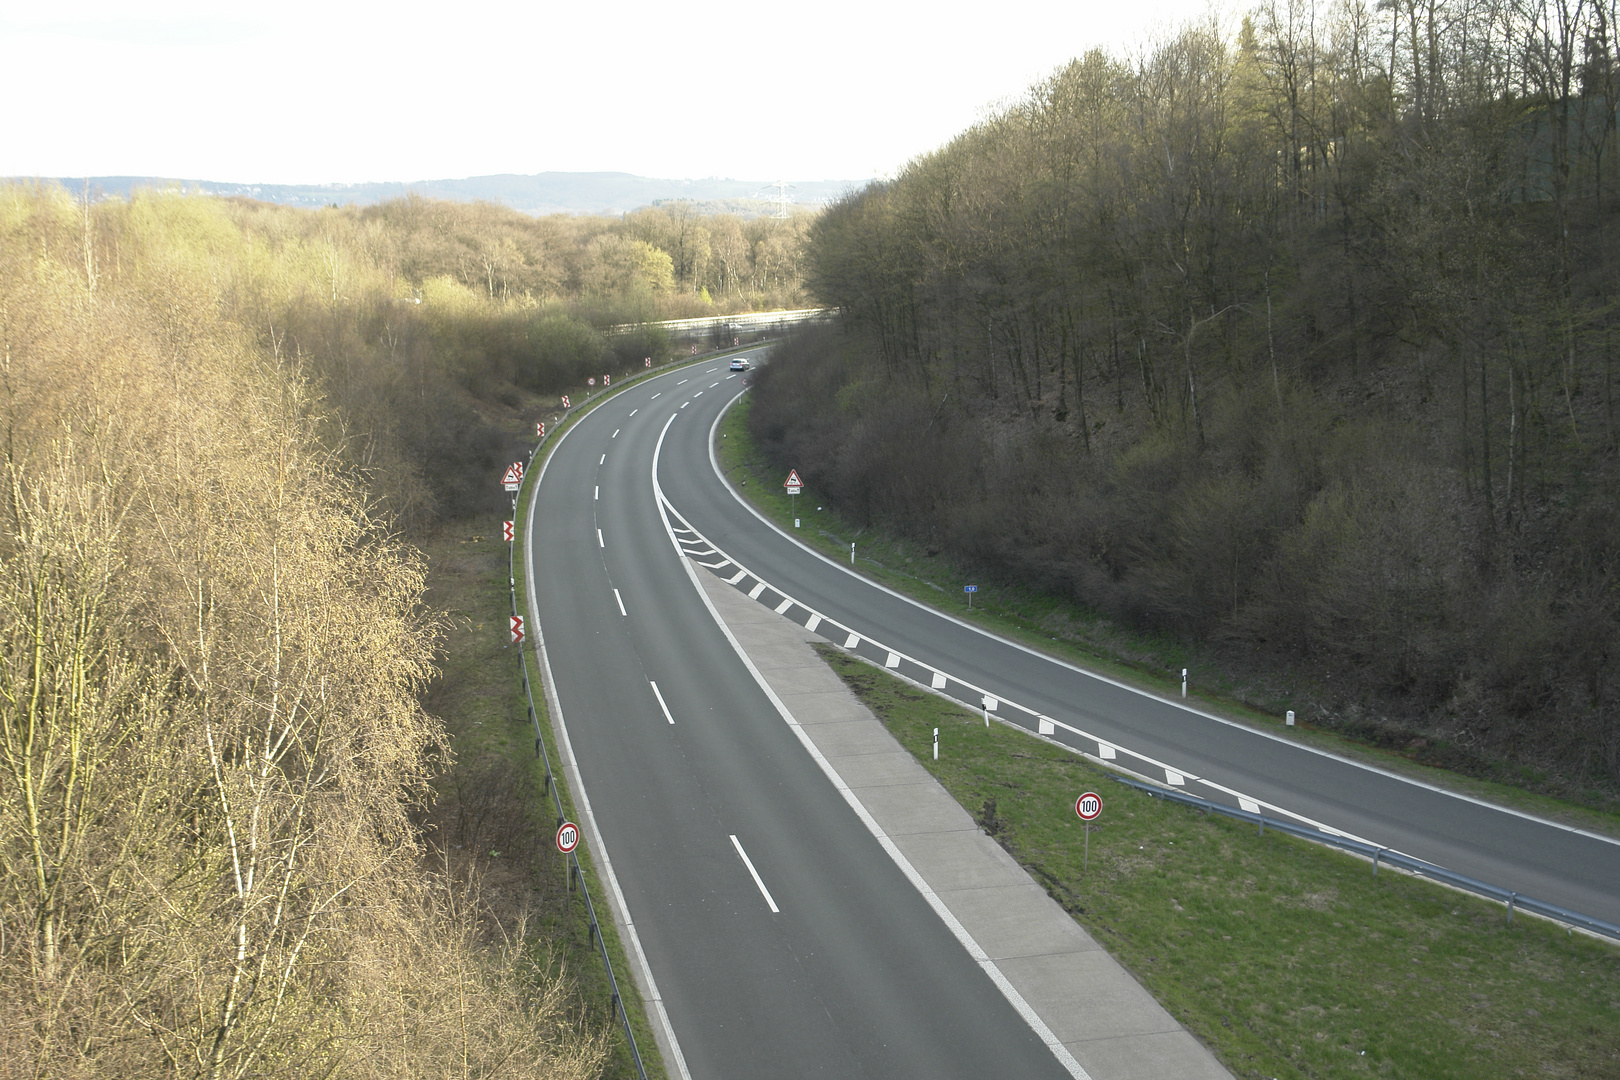 Autobahn Richtung Wuppertal nord